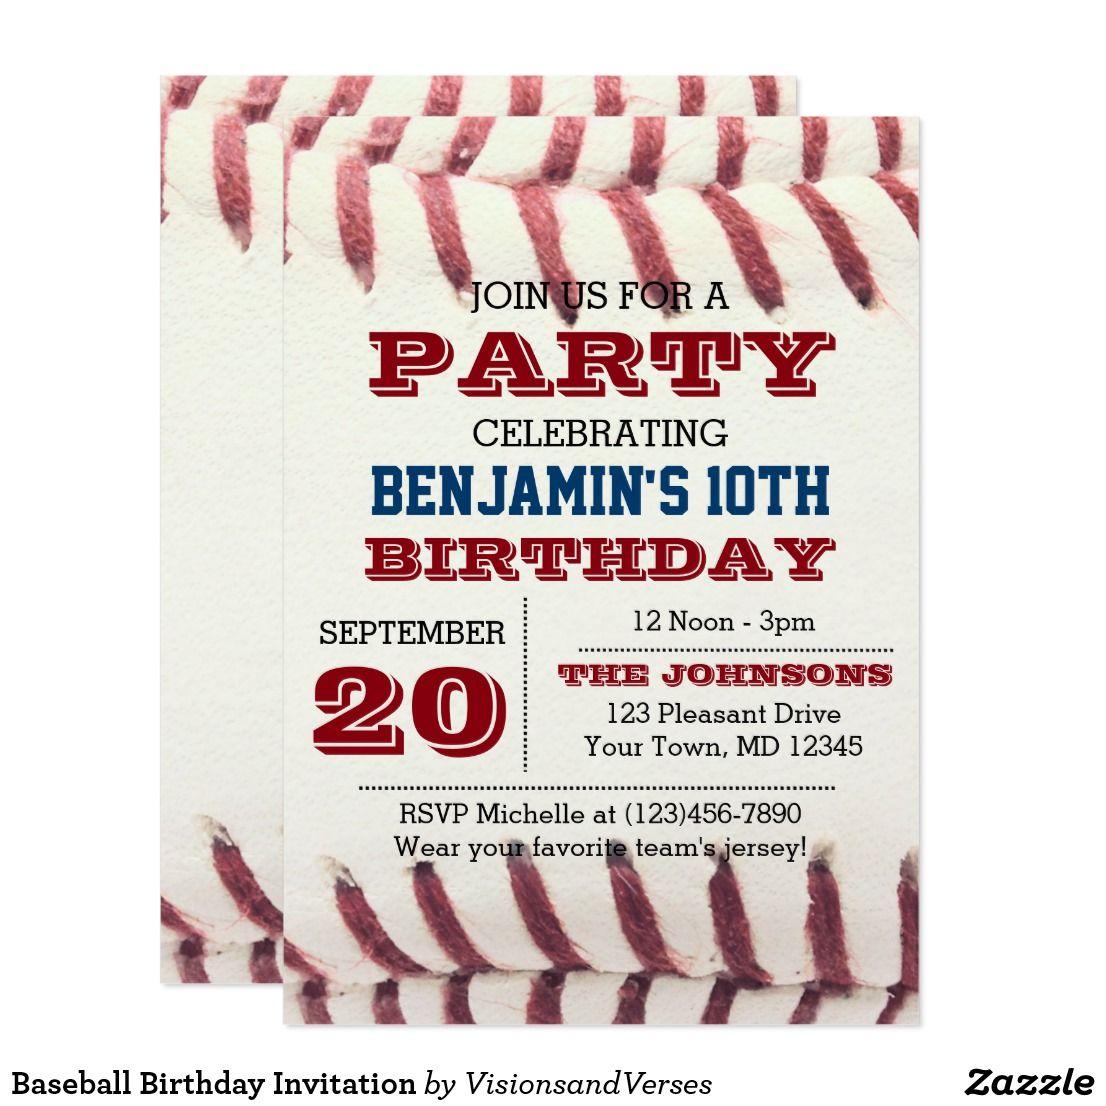 Baseball Birthday Invitation | Baseball birthday invitations and ...